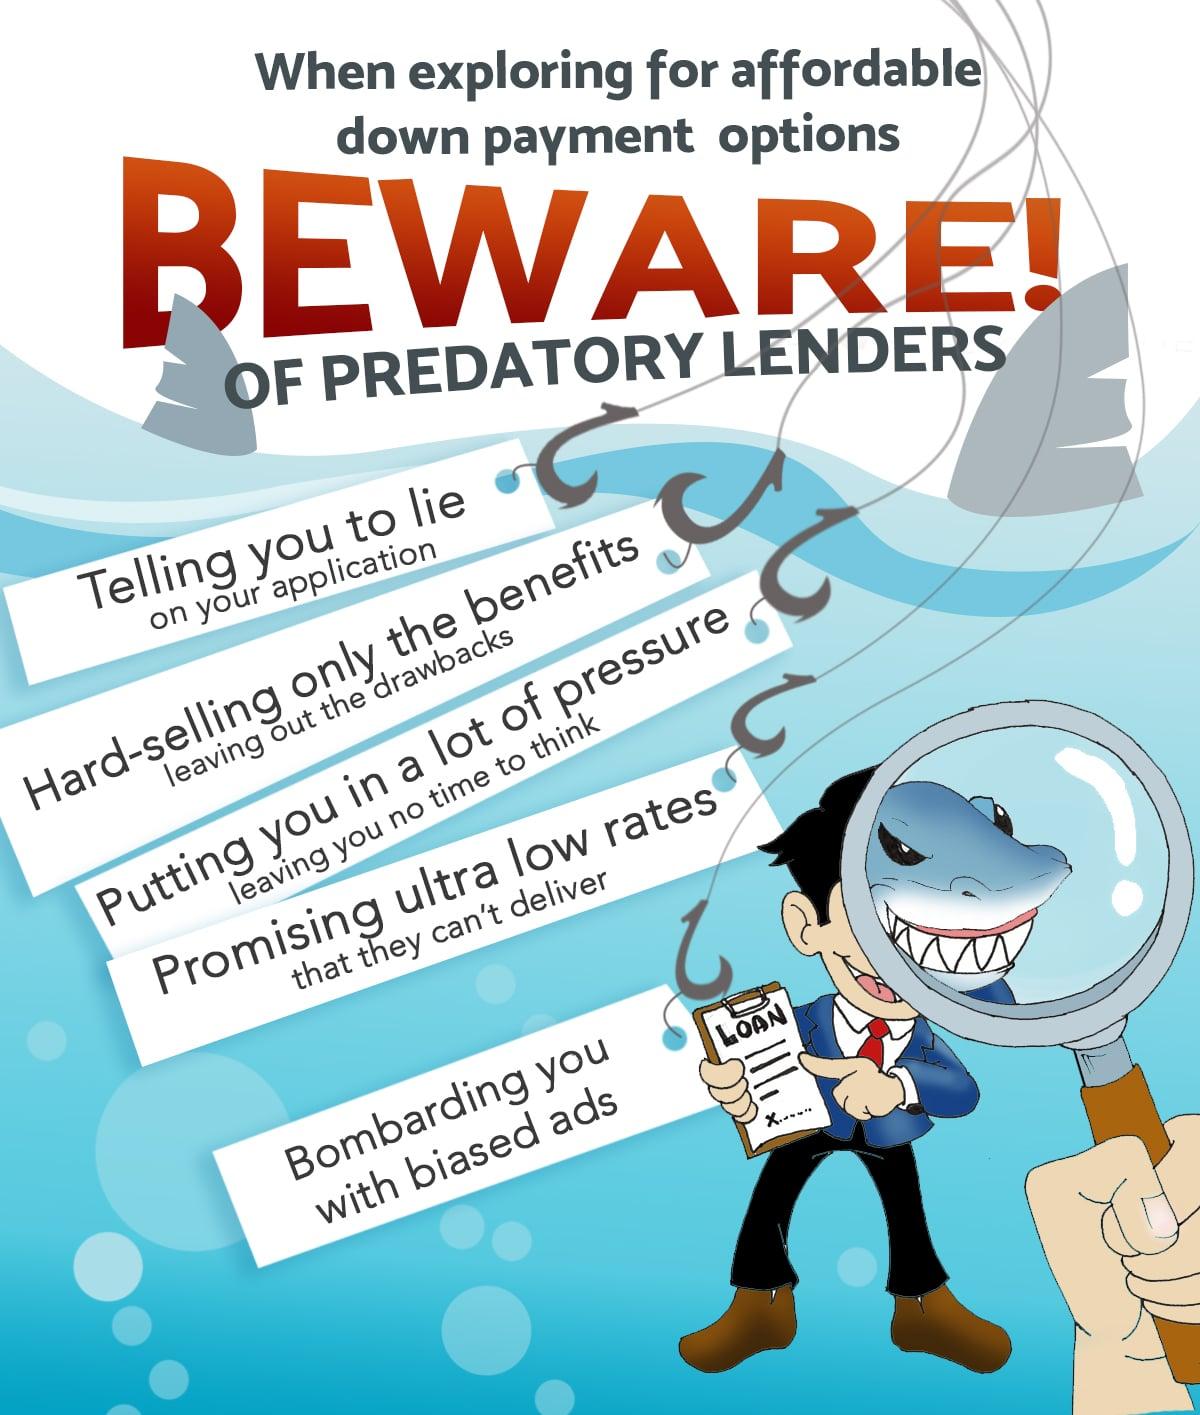 Predatory Loan - Take care!